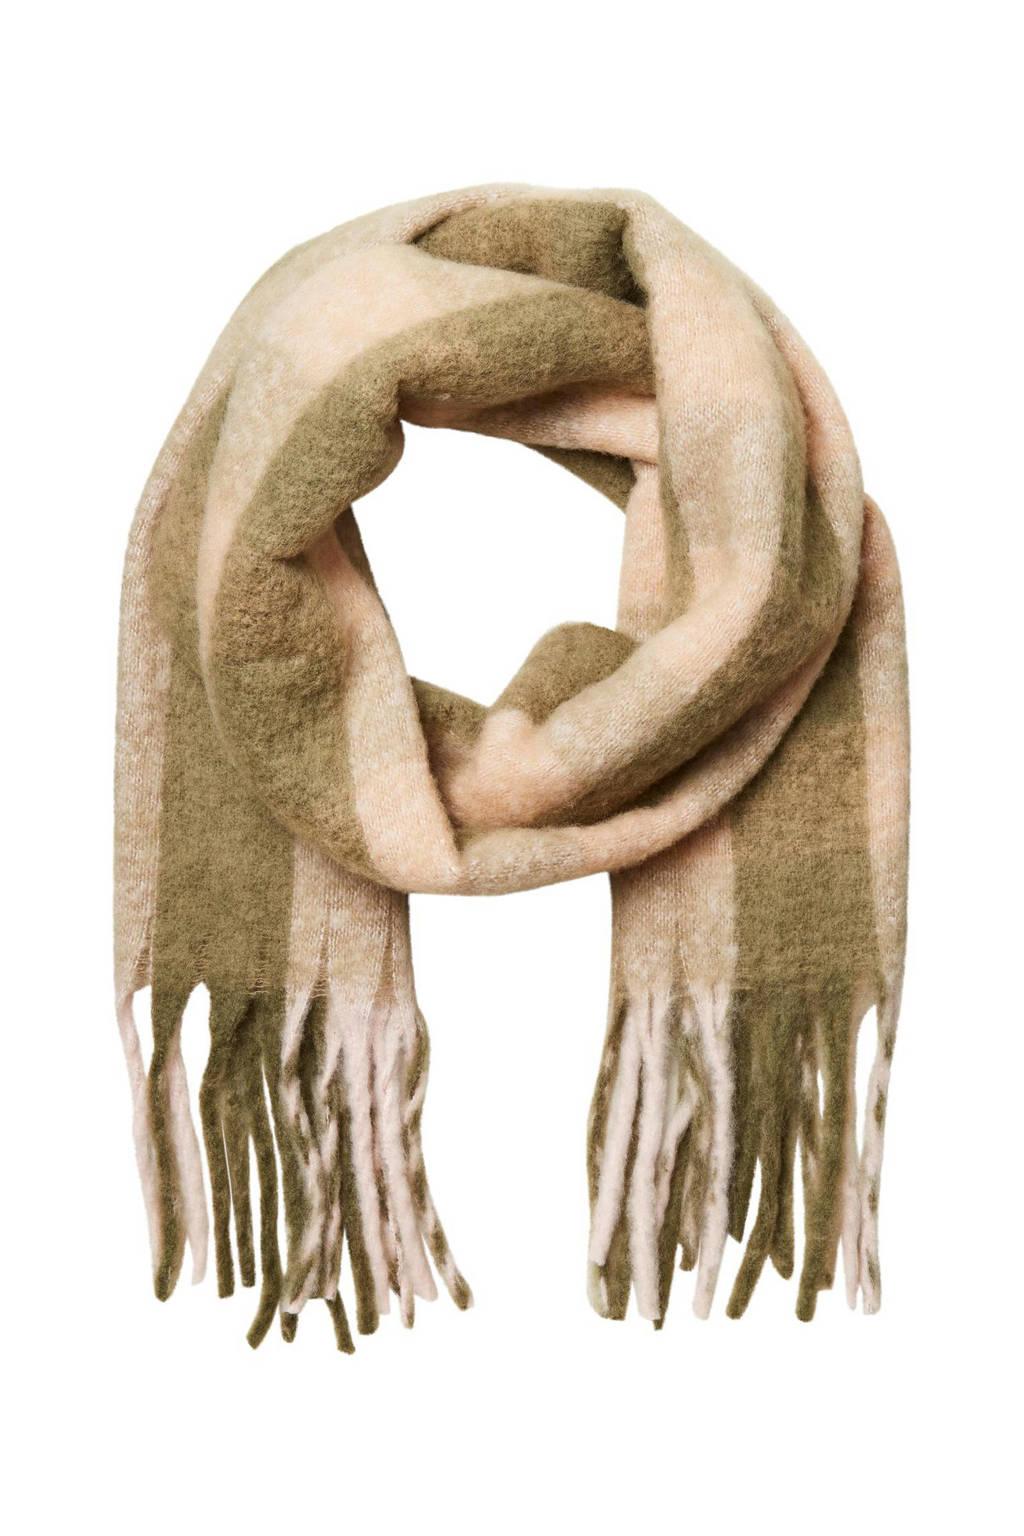 SELECTED FEMME geruite sjaal SLFTALLY groen/lichtroze, Groen/lichtroze